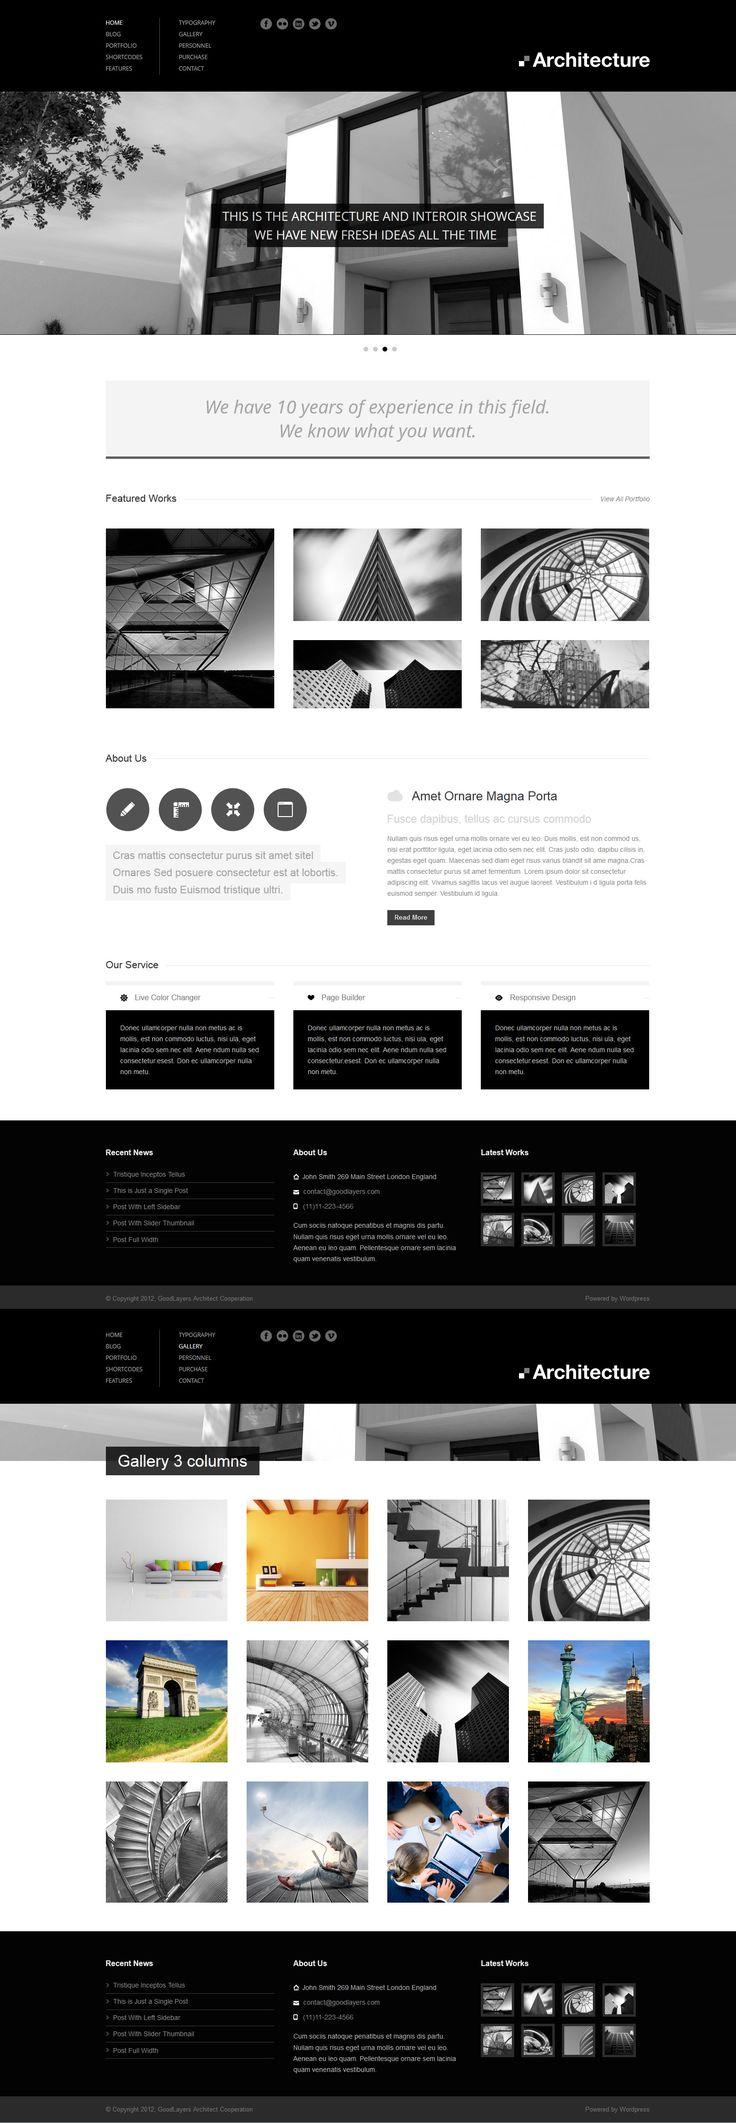 Architecture   Responsive, Full-photo, Fixed-Header, Wordpress Template   themeforest   http://themes.goodlayers2.com/architecture/ Get this template from: http://themeforest.net/?ref=Vision7Studio